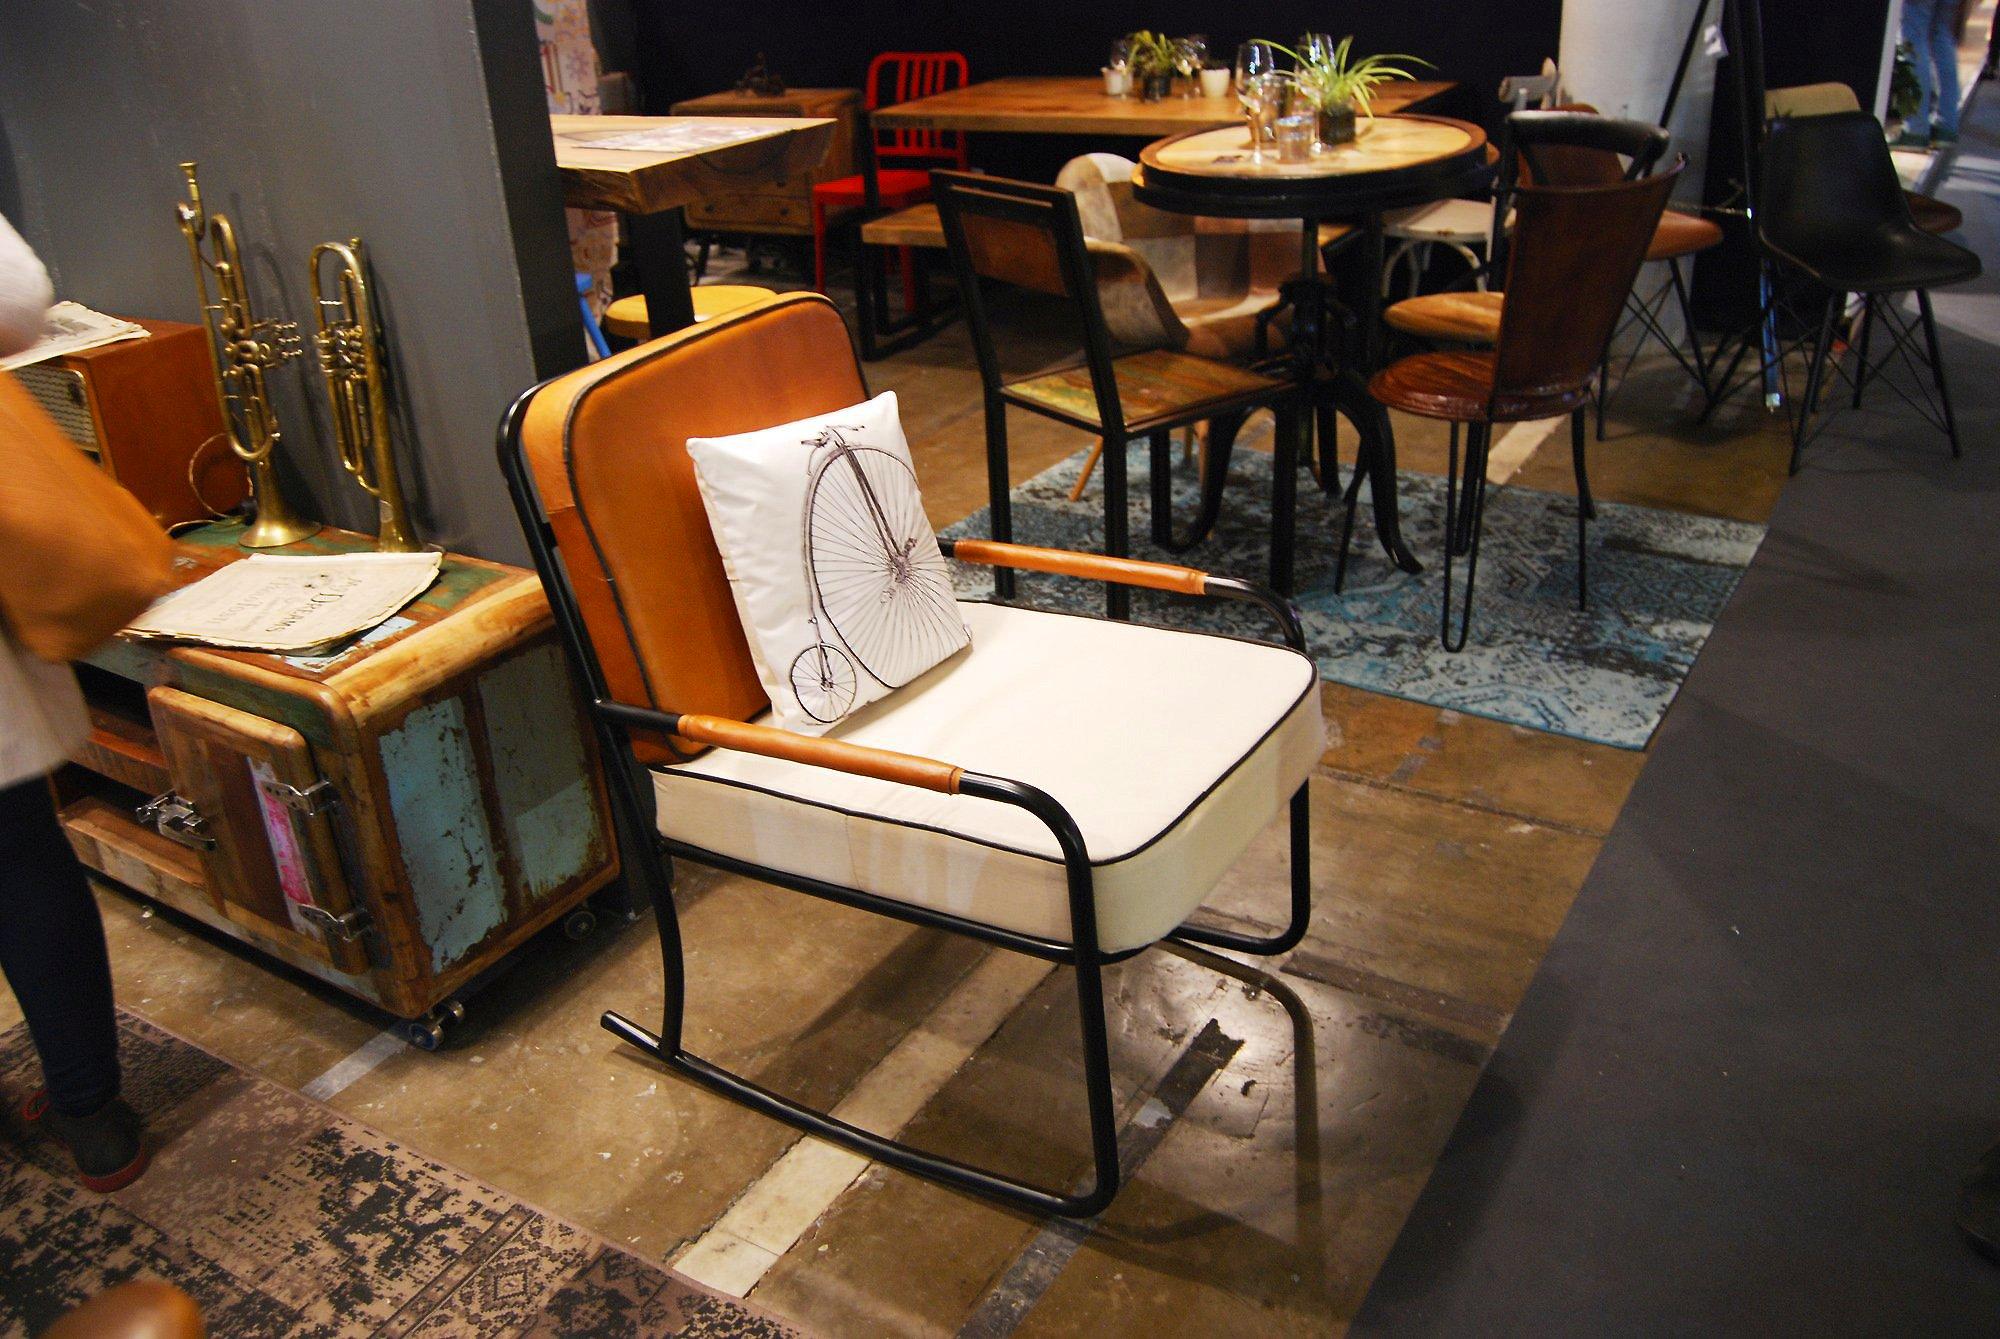 MIGO_ industrijski dizajn_fotelja 1_salon namestaja